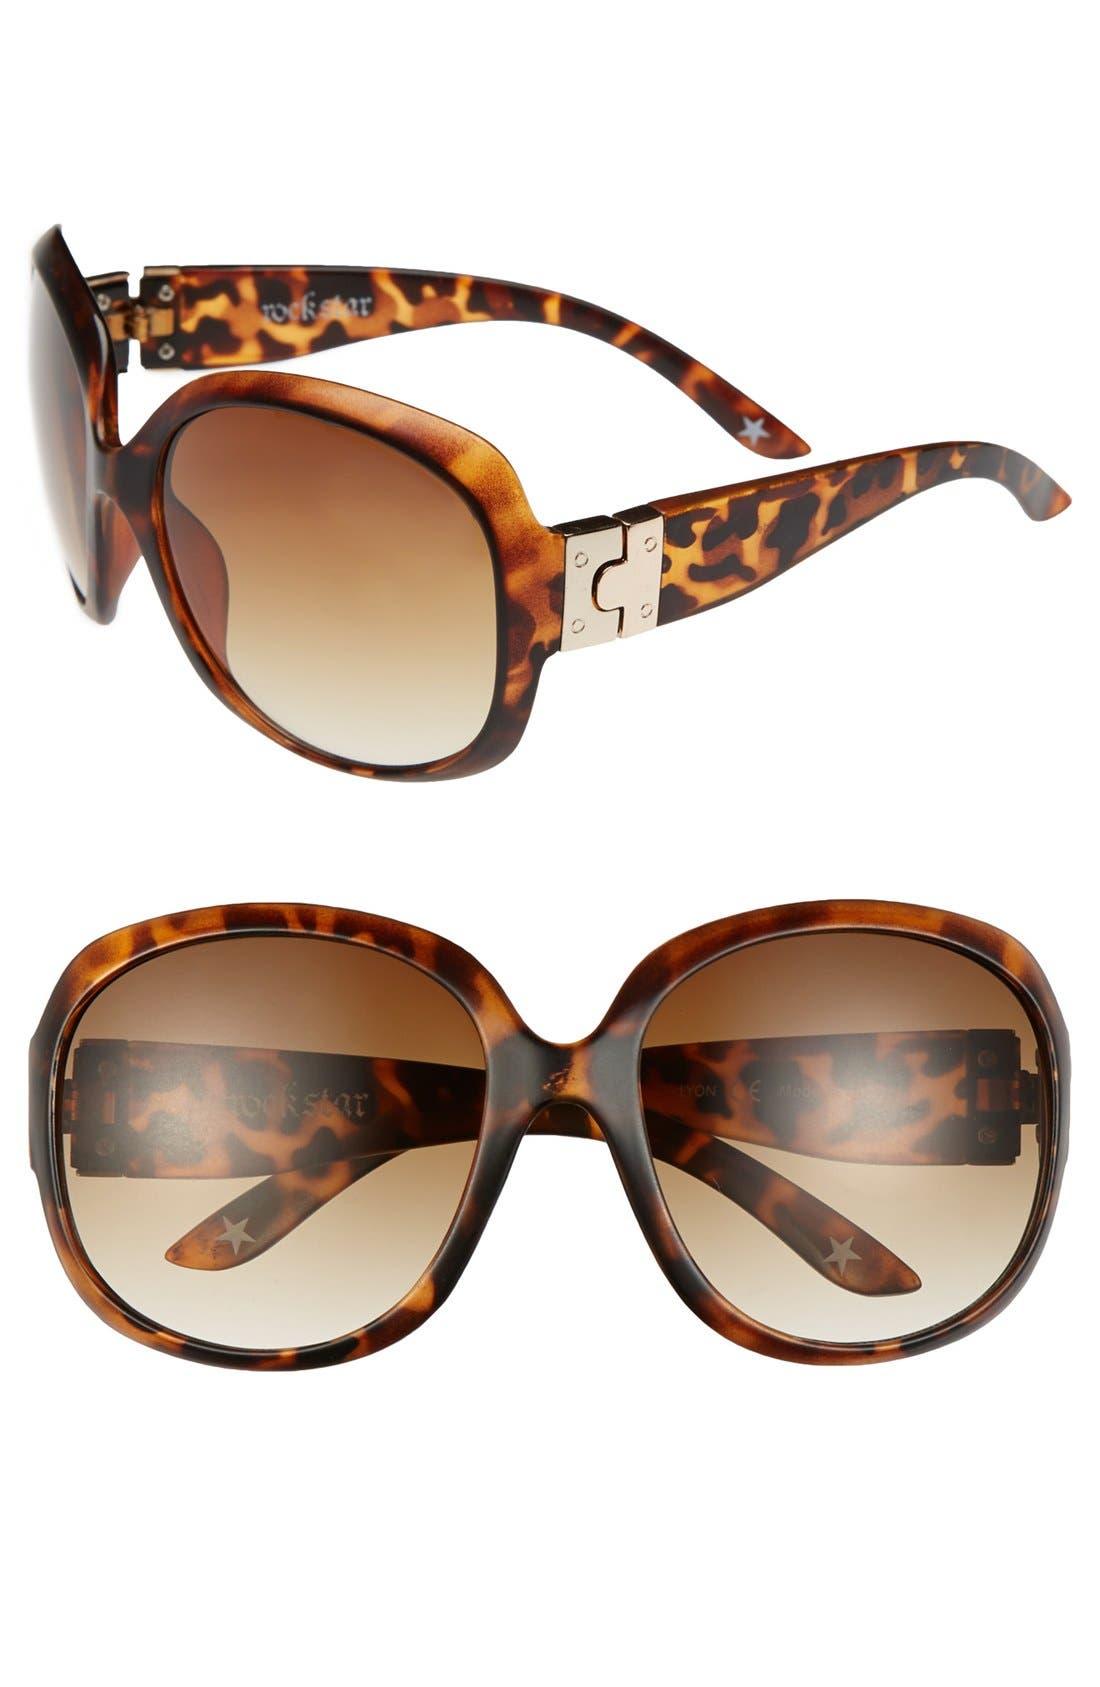 Main Image - Leith 'Anna' Oversized Sunglasses